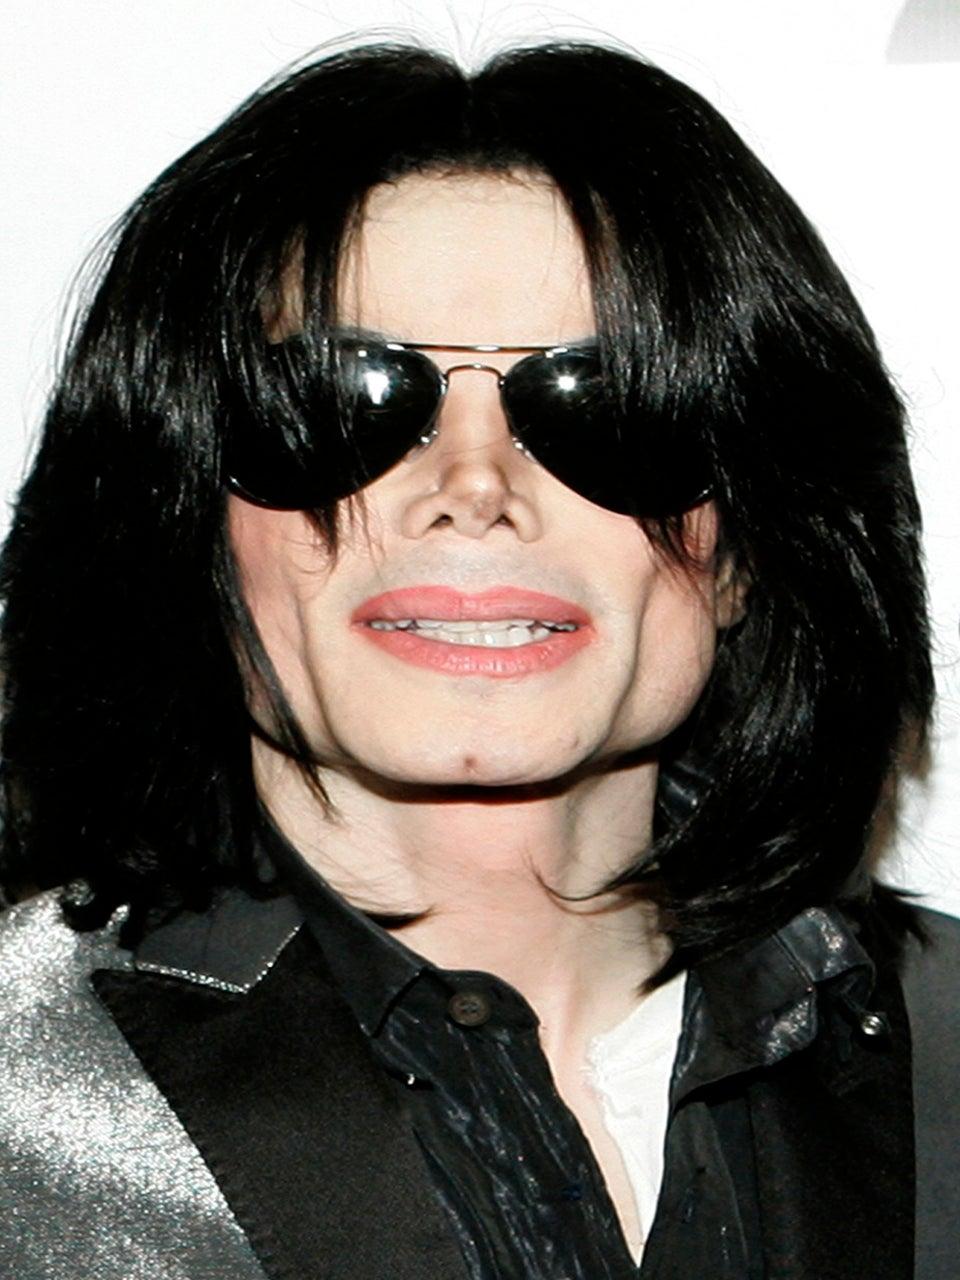 Michael Jackson's Autopsy Photos Shown in Court